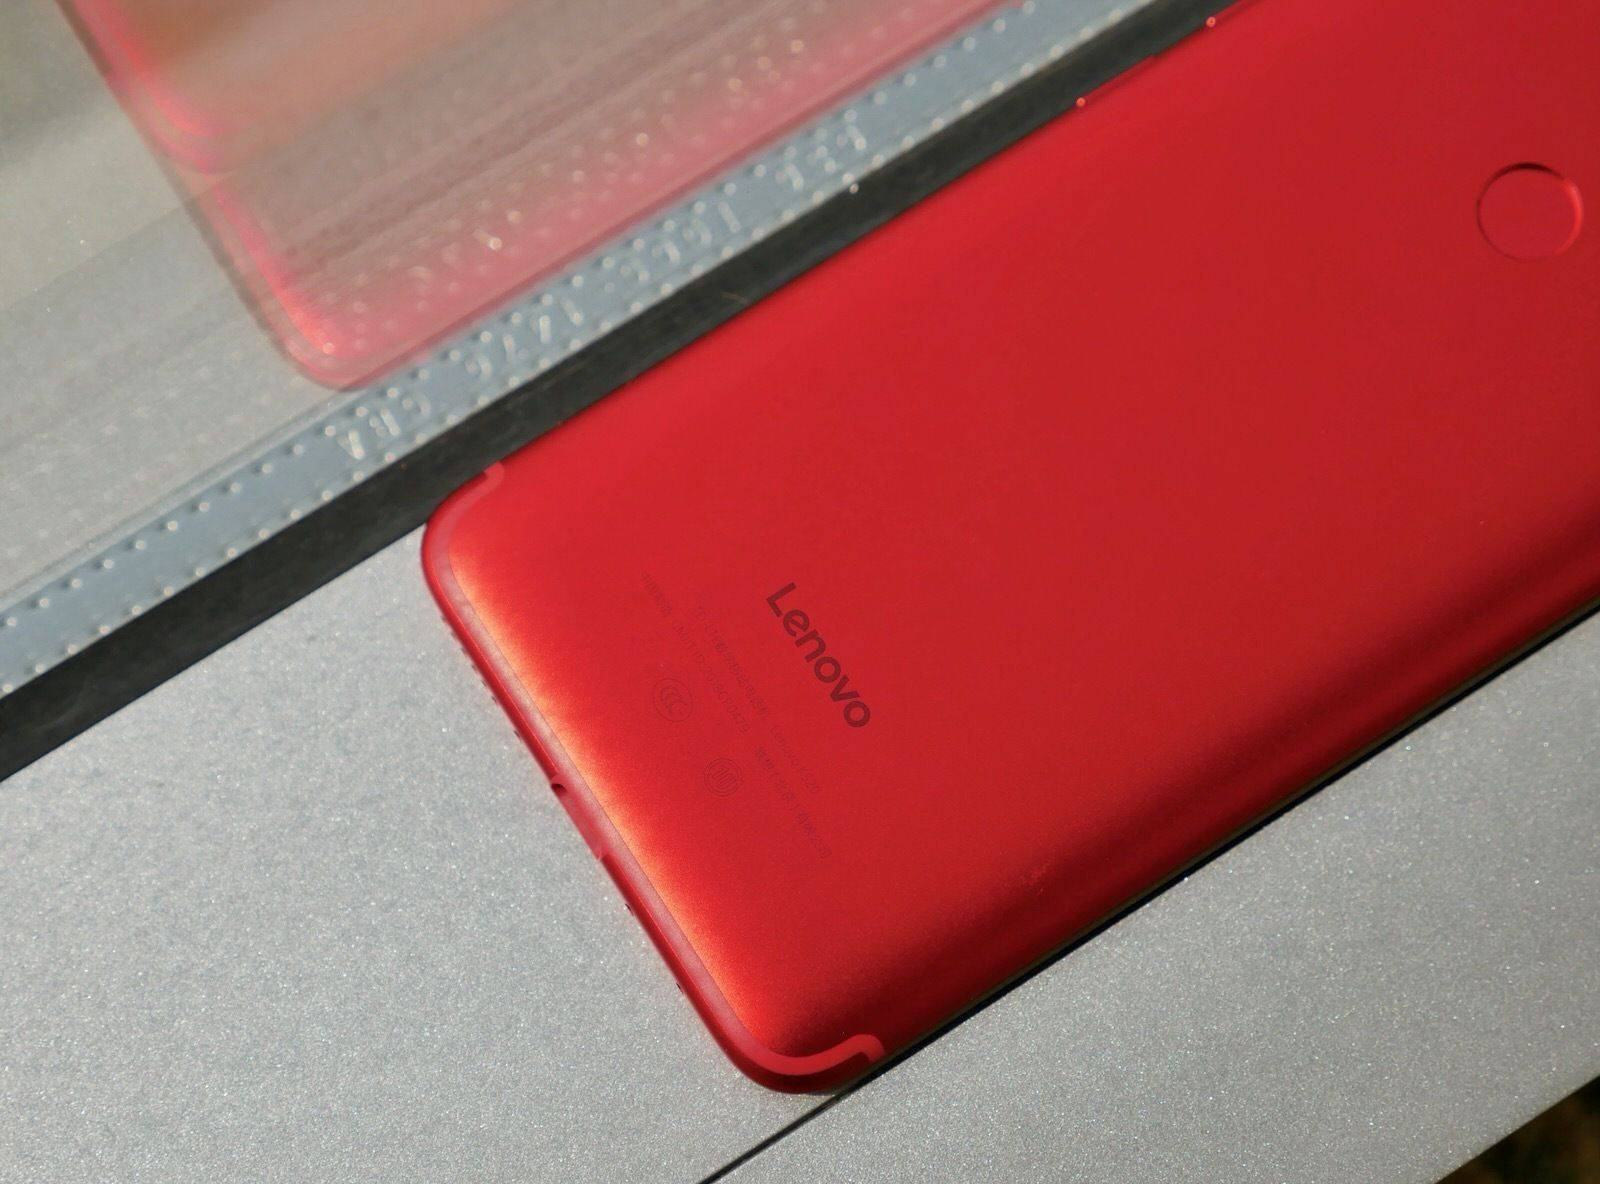 Lenovo S5 first impressions